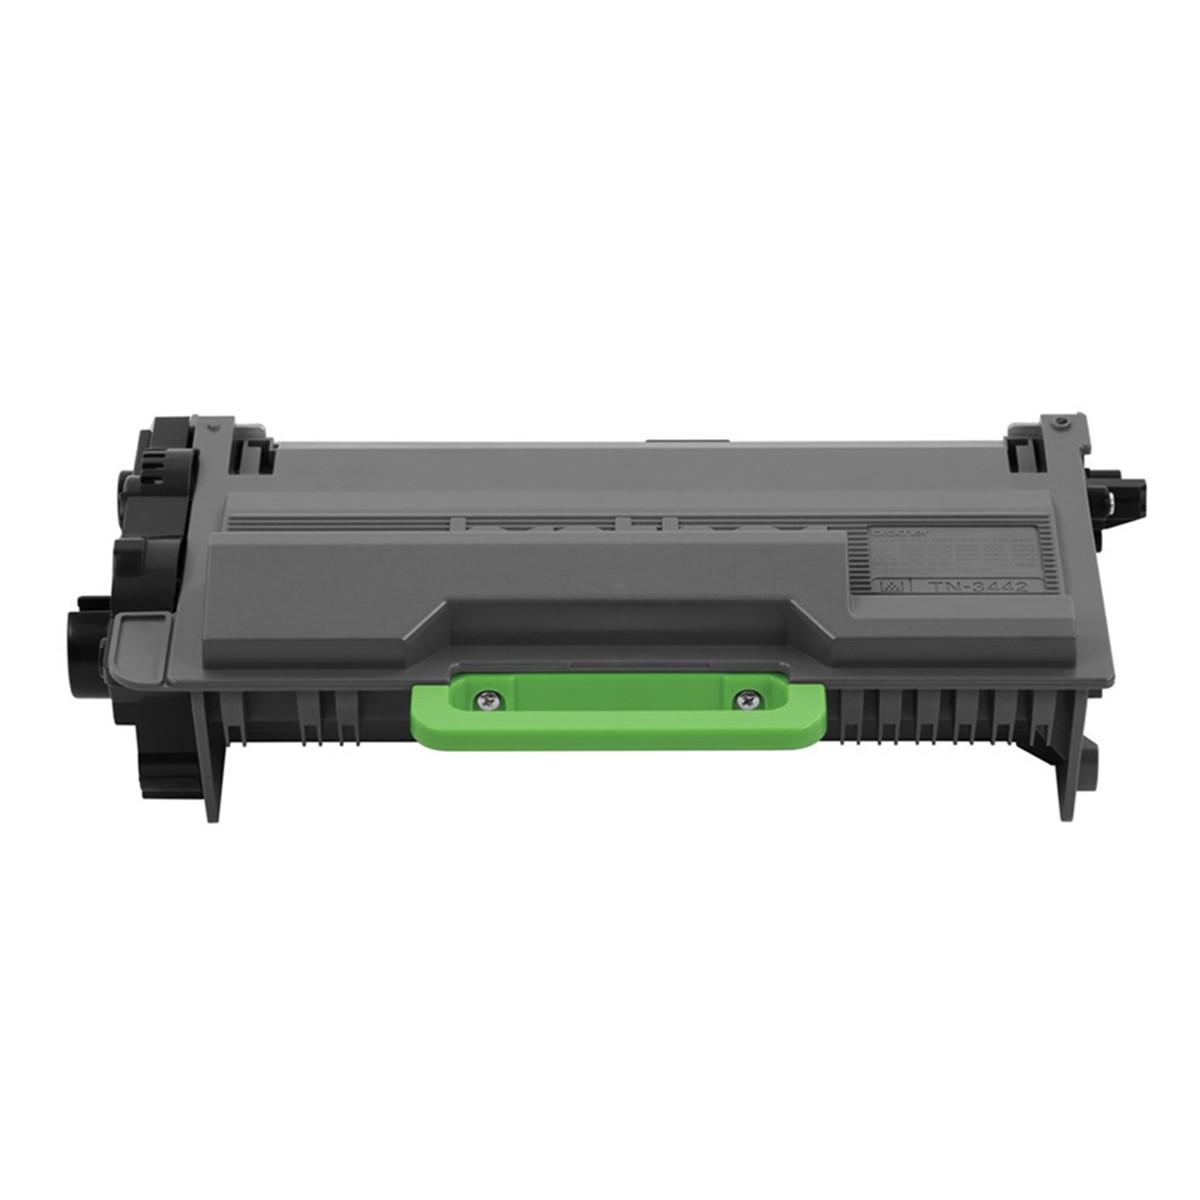 Toner Compatível com Brother TN880 TN-880 | HL-L6200DW HL-L6250DW MFC-L6700DW HL-L6300 | Premium 12k